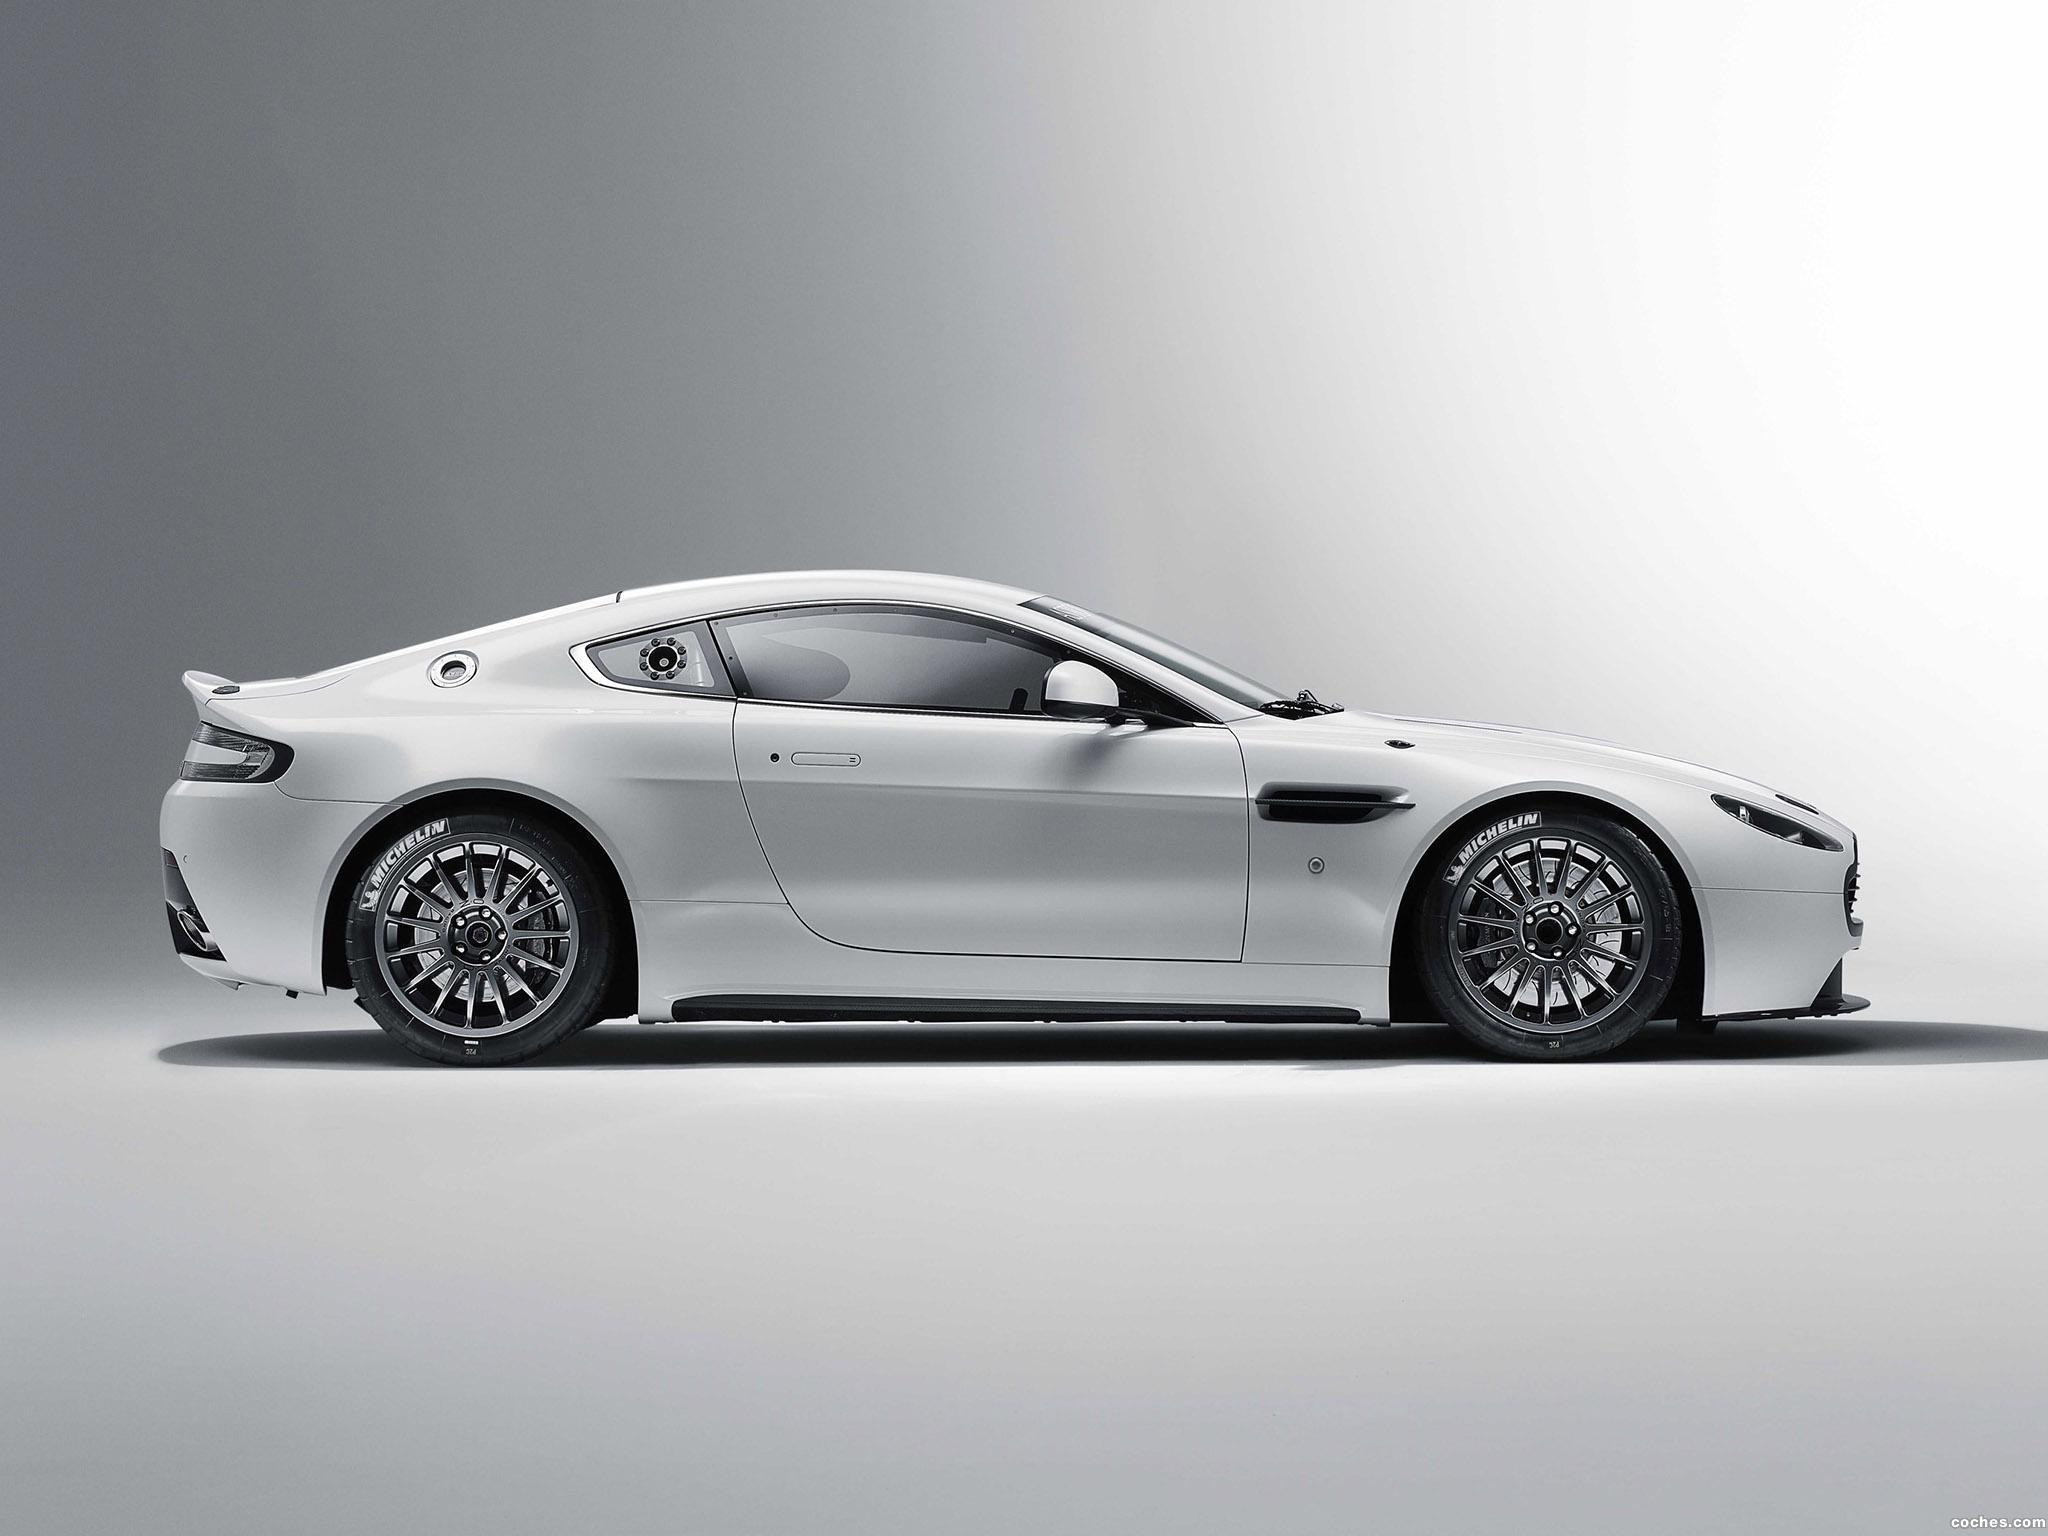 Foto 2 de Aston Martin V8 Vantage GT4 2010